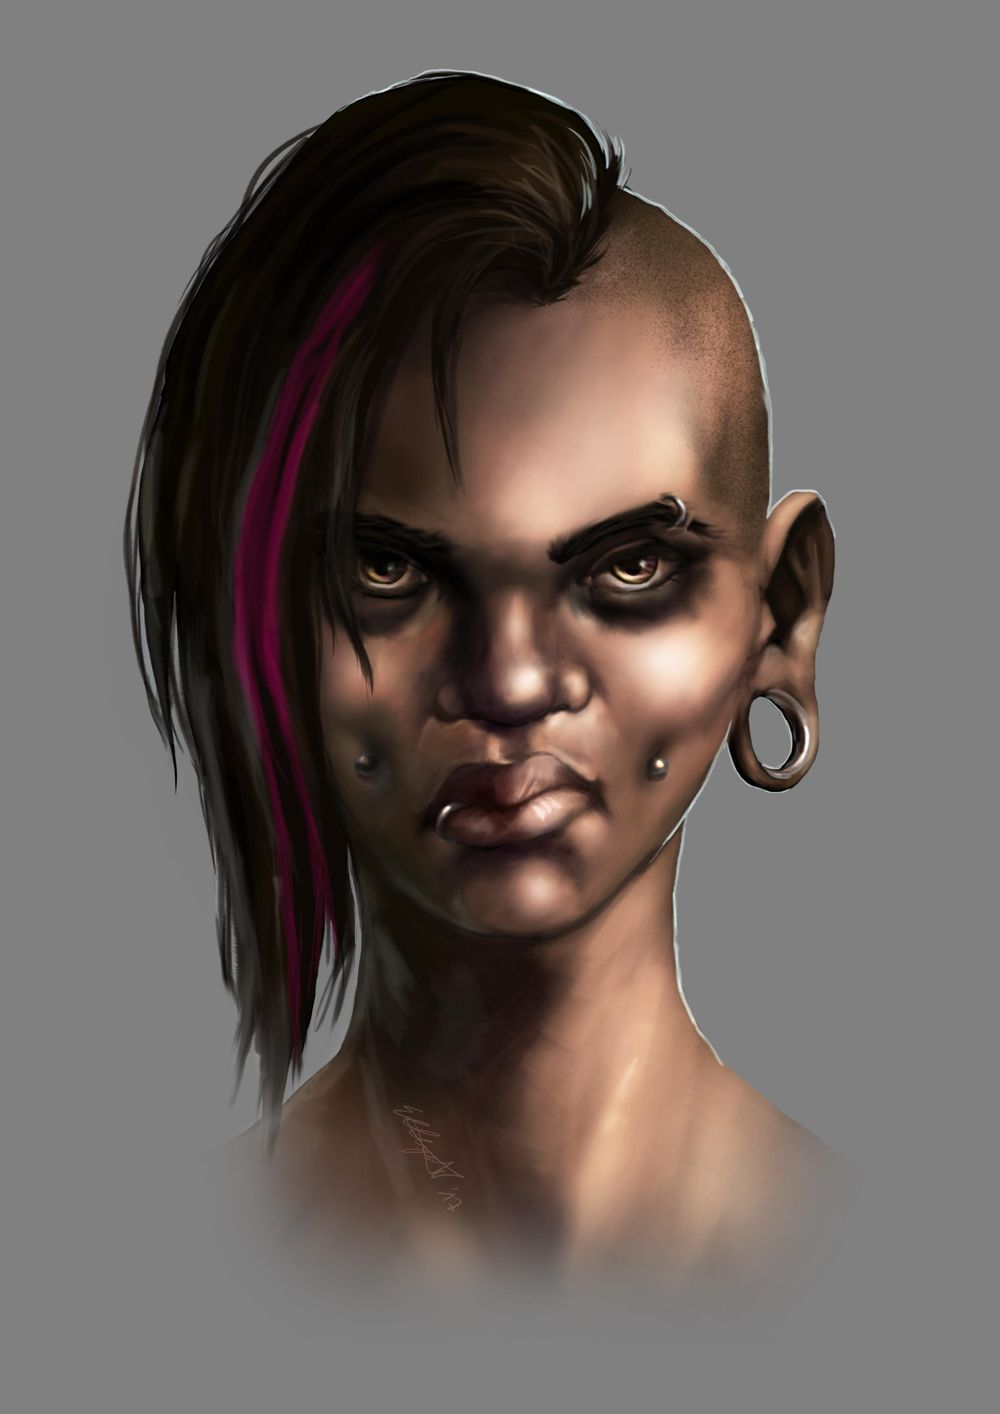 Head Study (Male, Female, Villain, Punk Girl, Buddy) - image 15 - student project